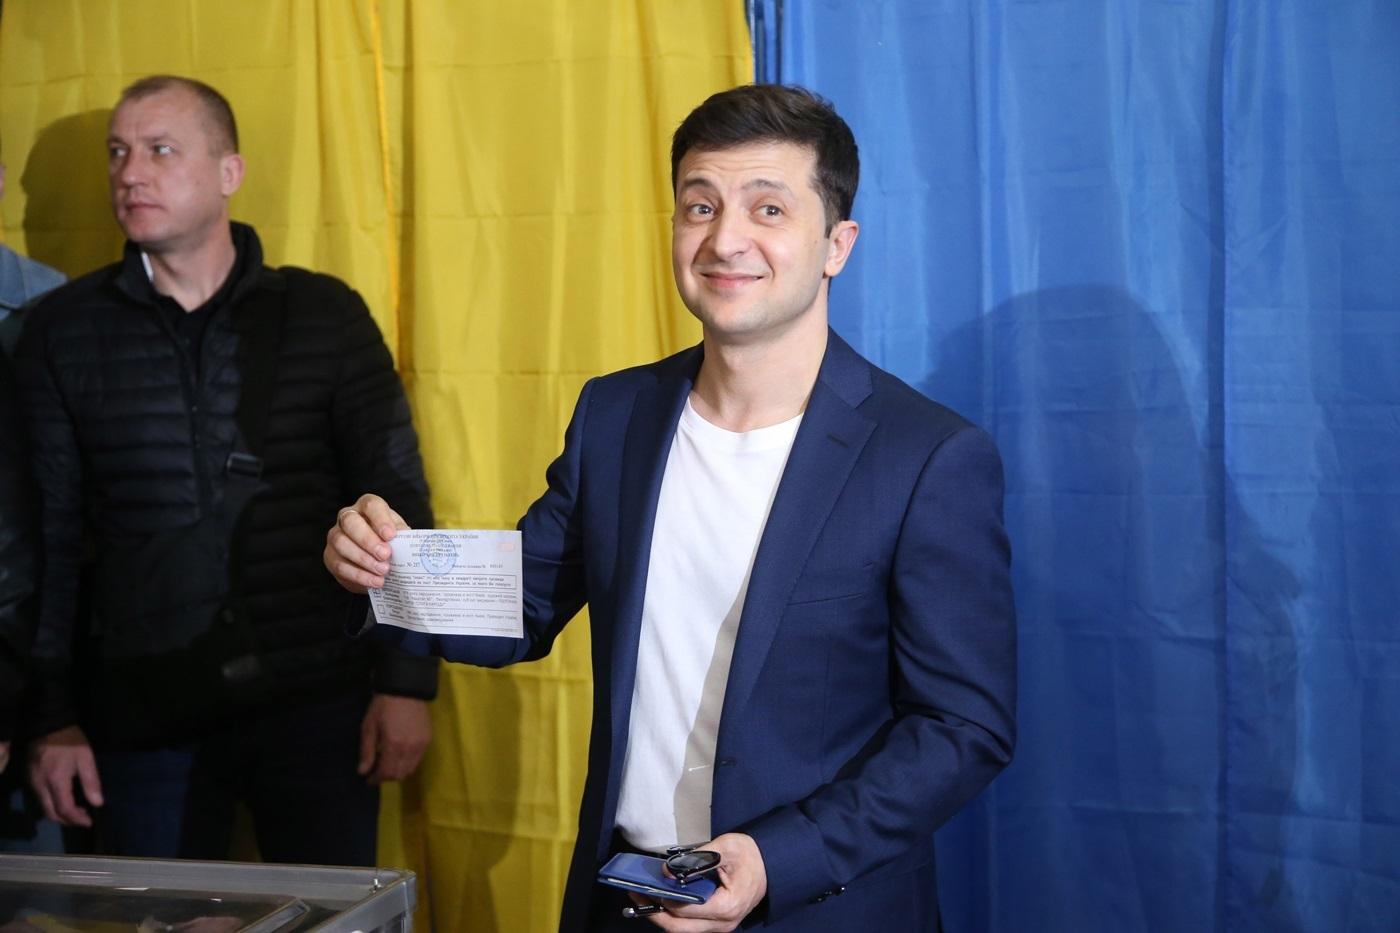 Владимиру Зеленскому за это фото грози наказание за демонстрацию бюллютеня